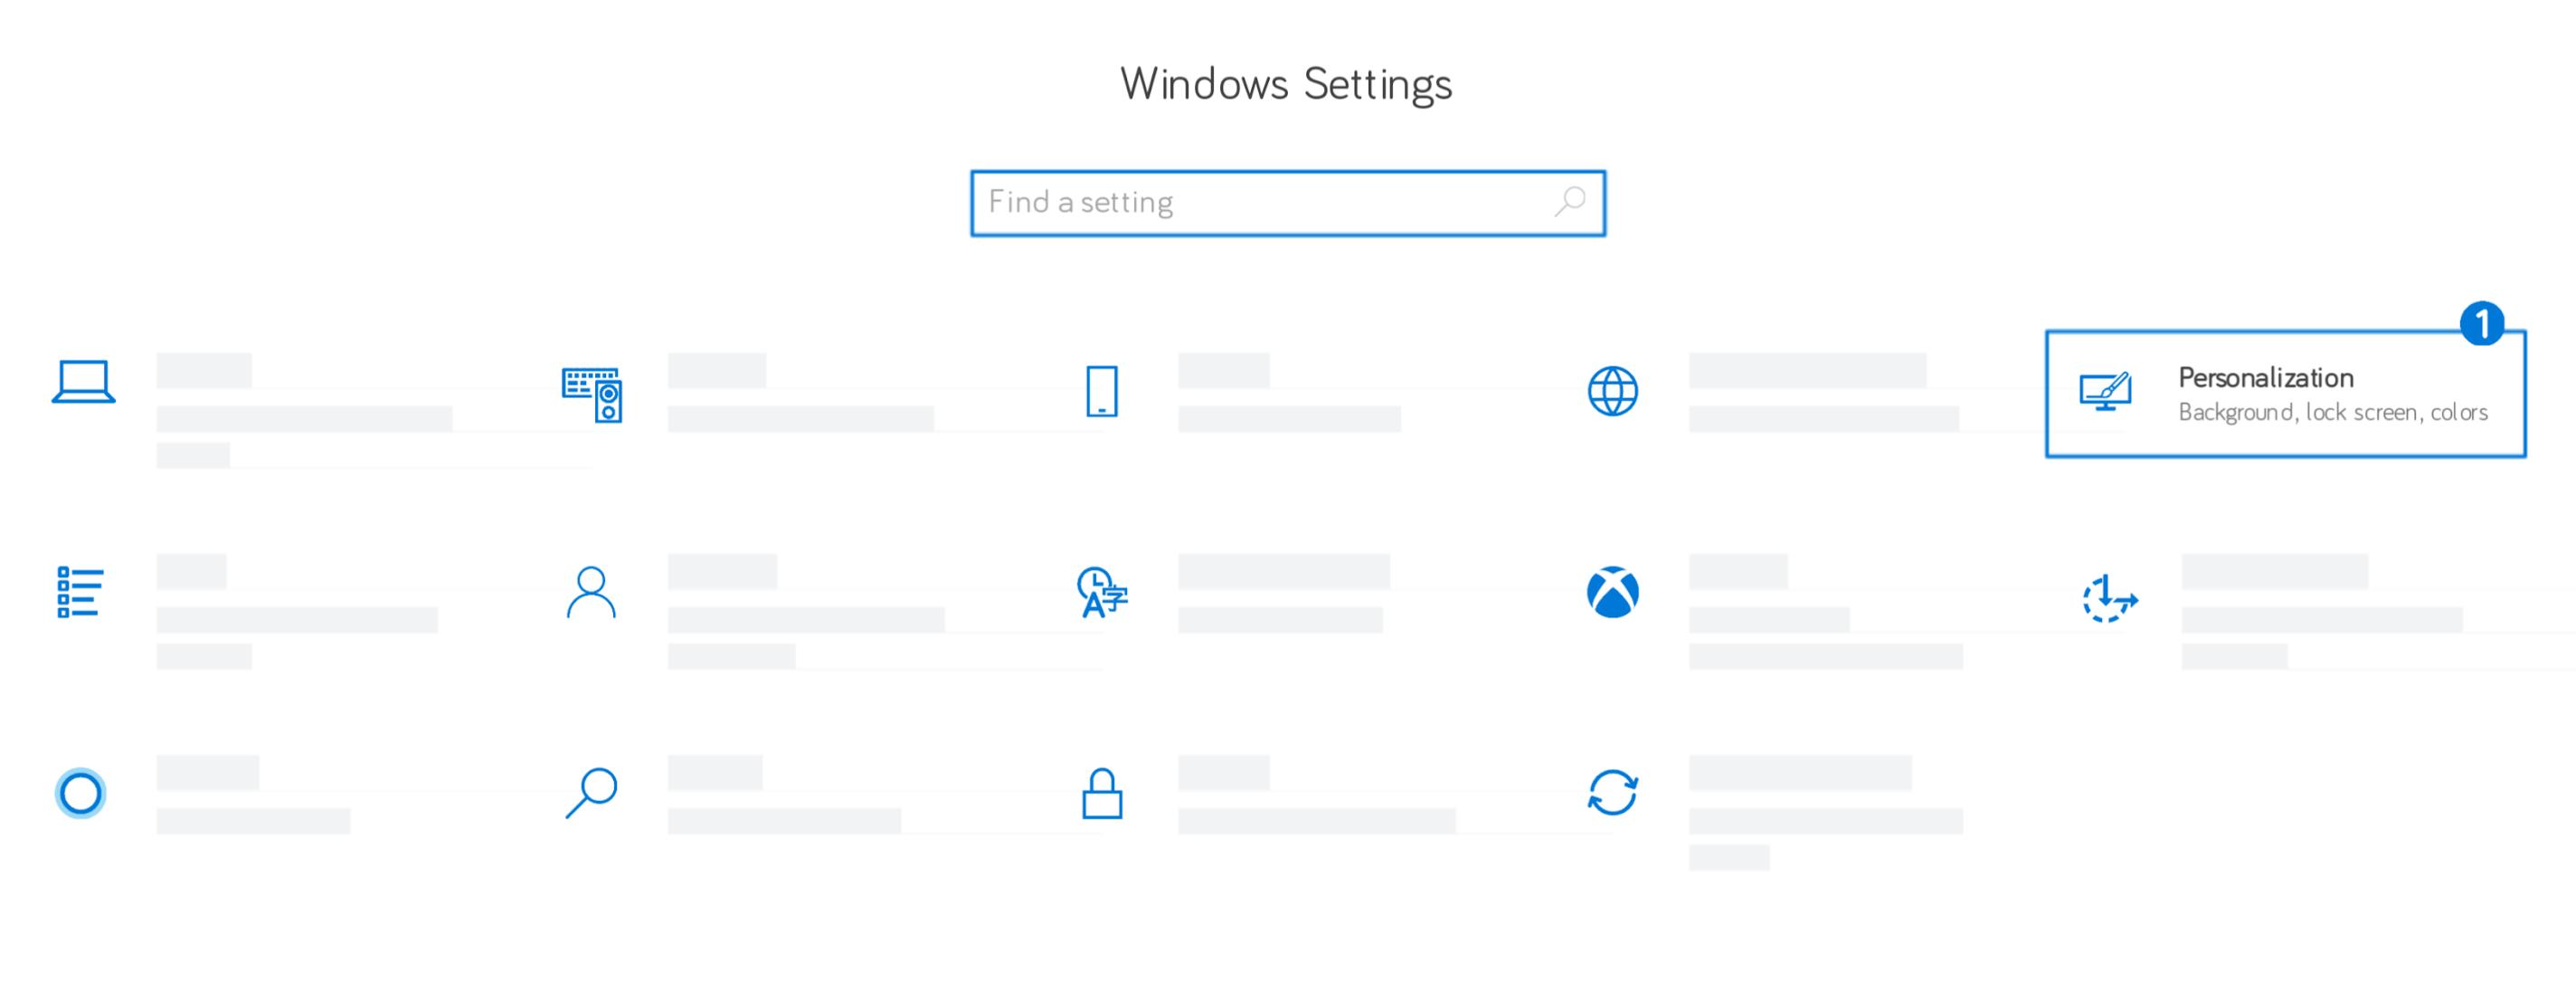 Windows - Windows Settings